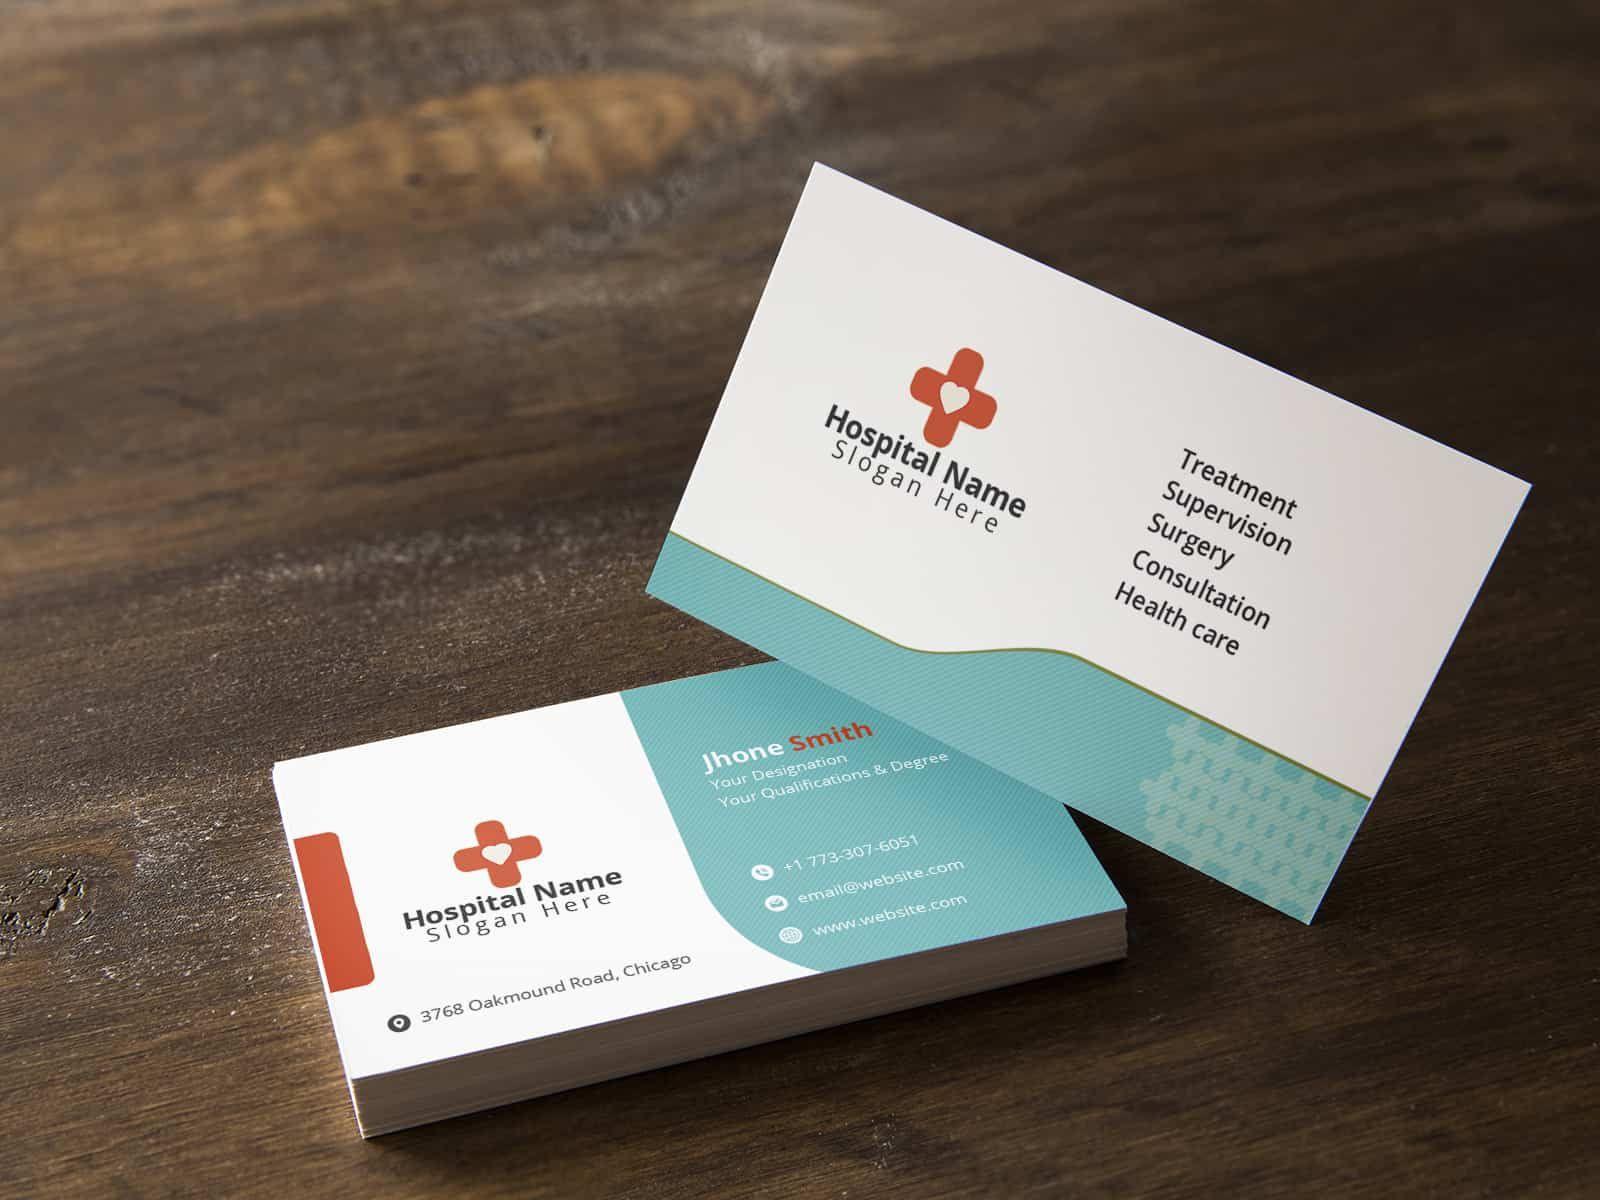 Medical Health Care Business Card Medical Business Card Medical Health Care Health Care